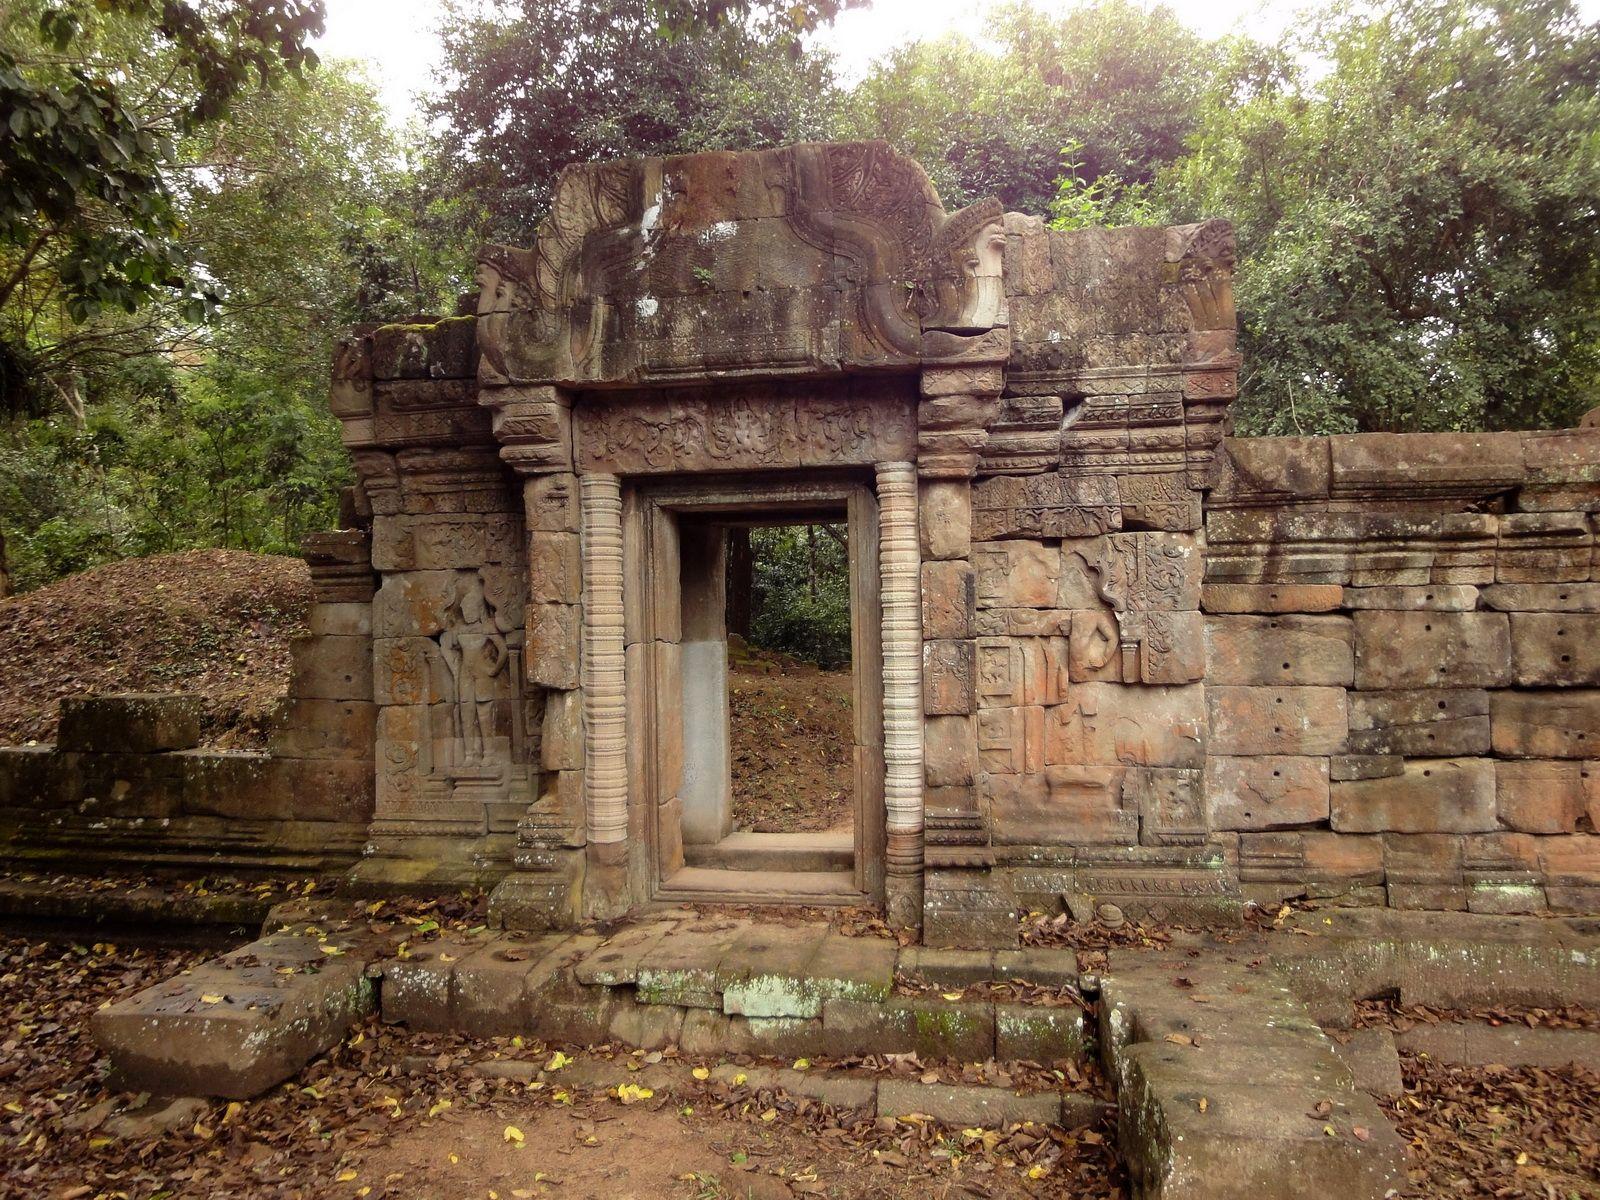 Baphuon temple gate Khmer style mid 11th century Angkor